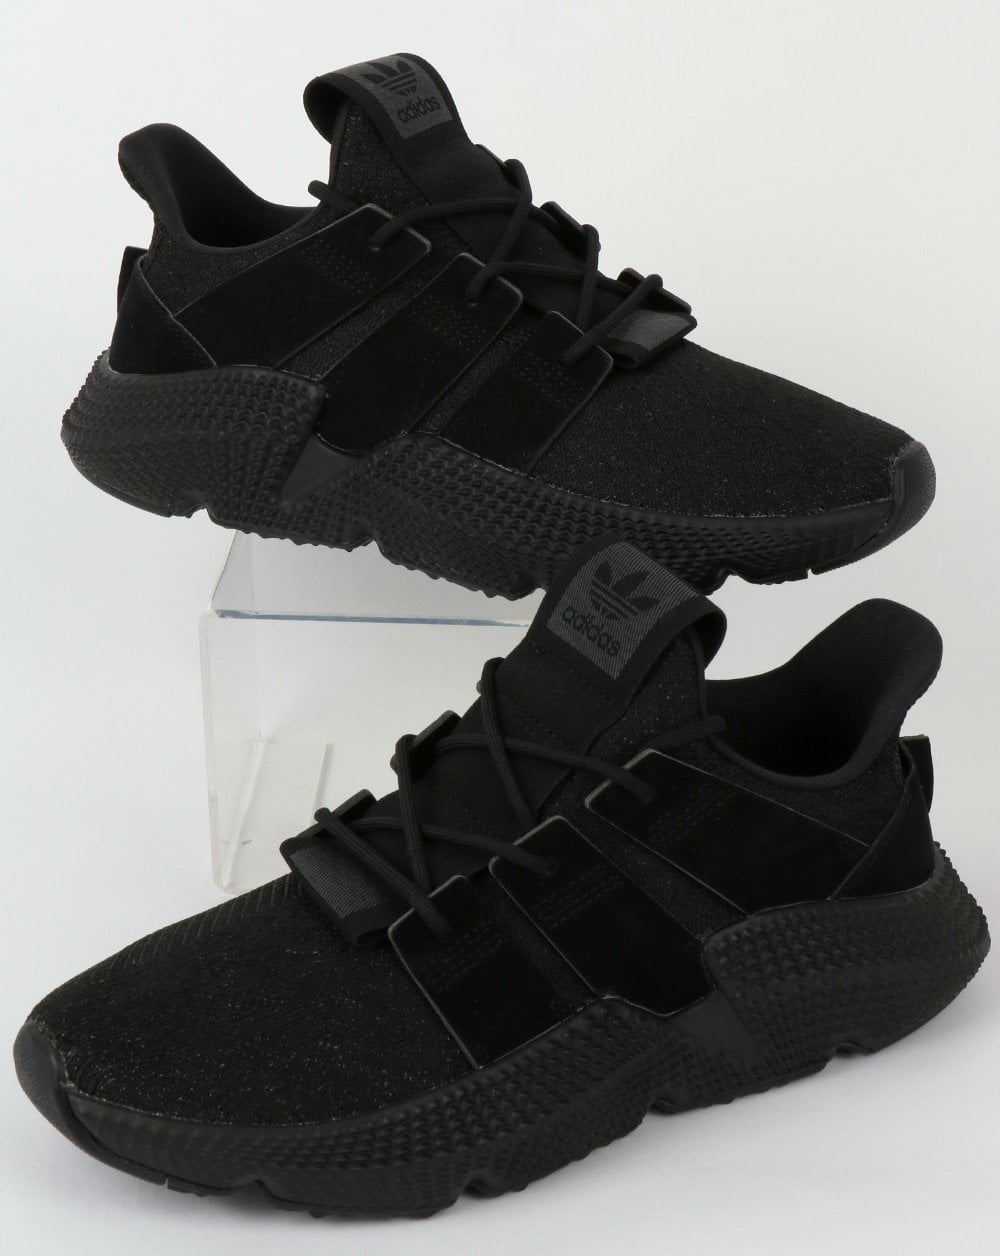 Adidas Prophere Trainers Triple Black